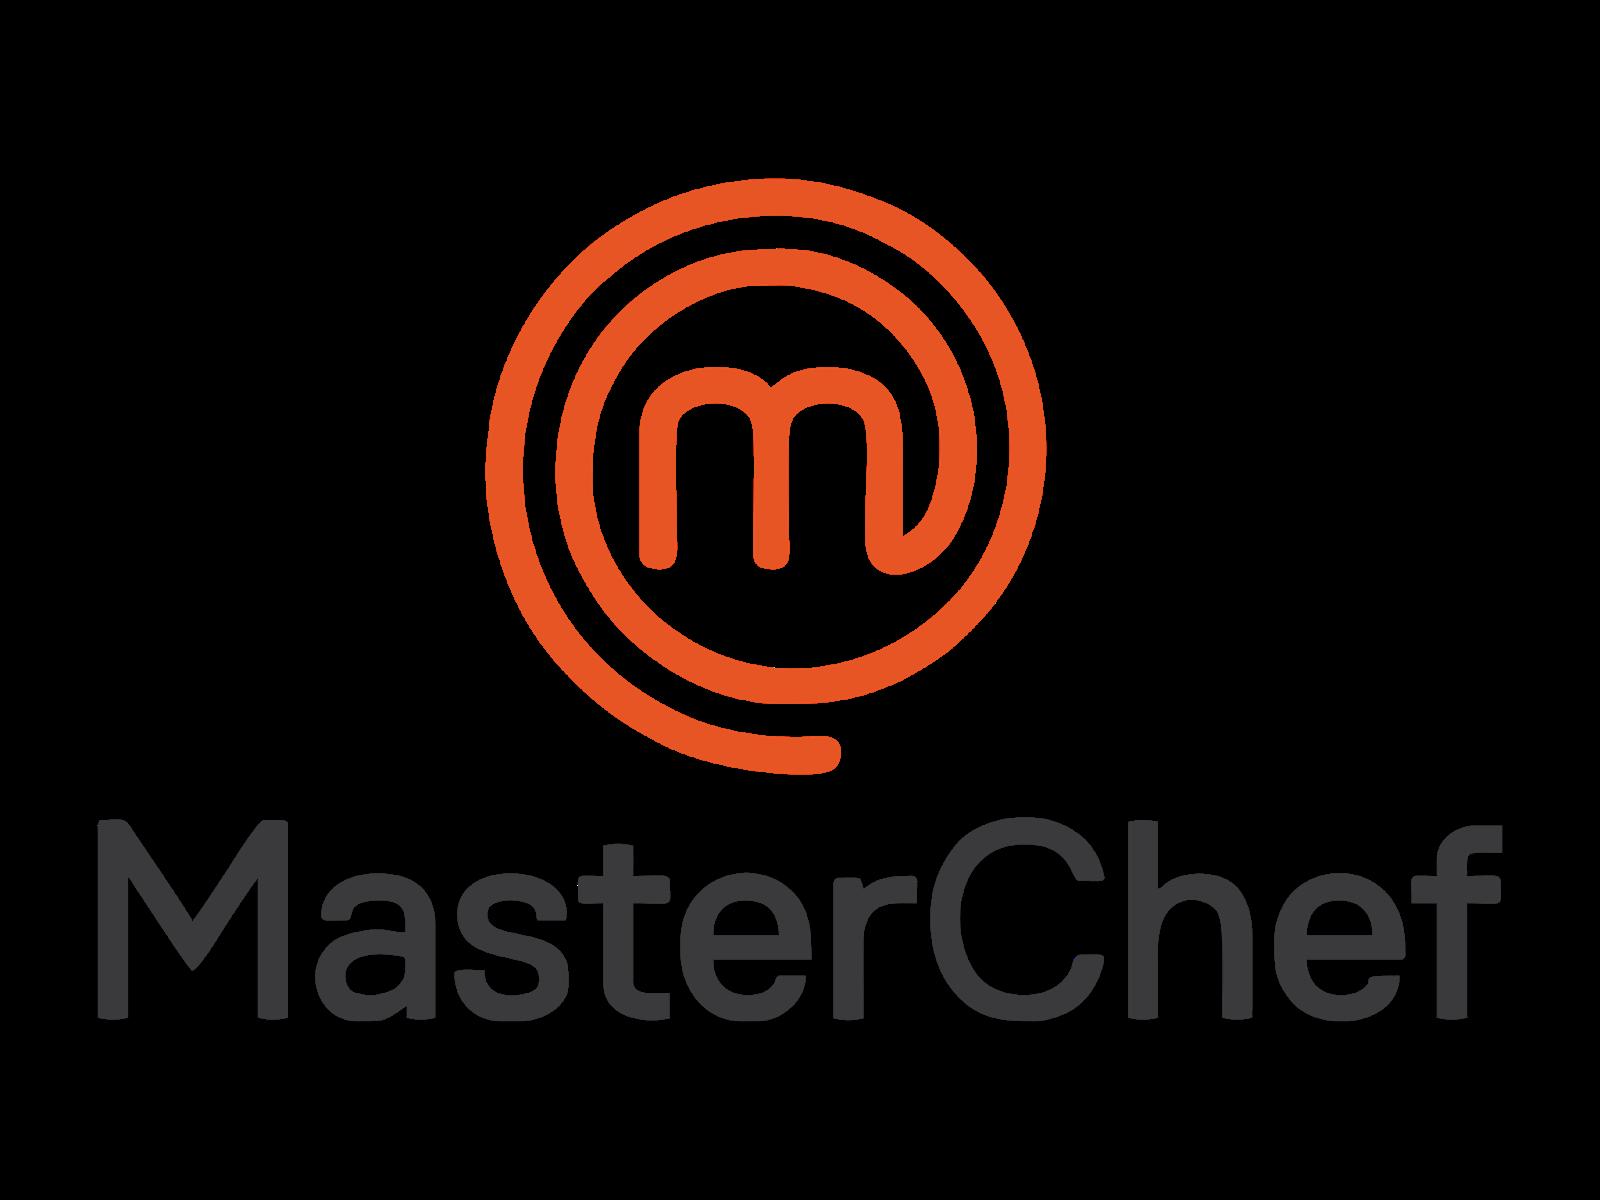 Gambar Logo Master Chef Logo Masterchef Indonesia Vector Cdr Png Hd Biologizone